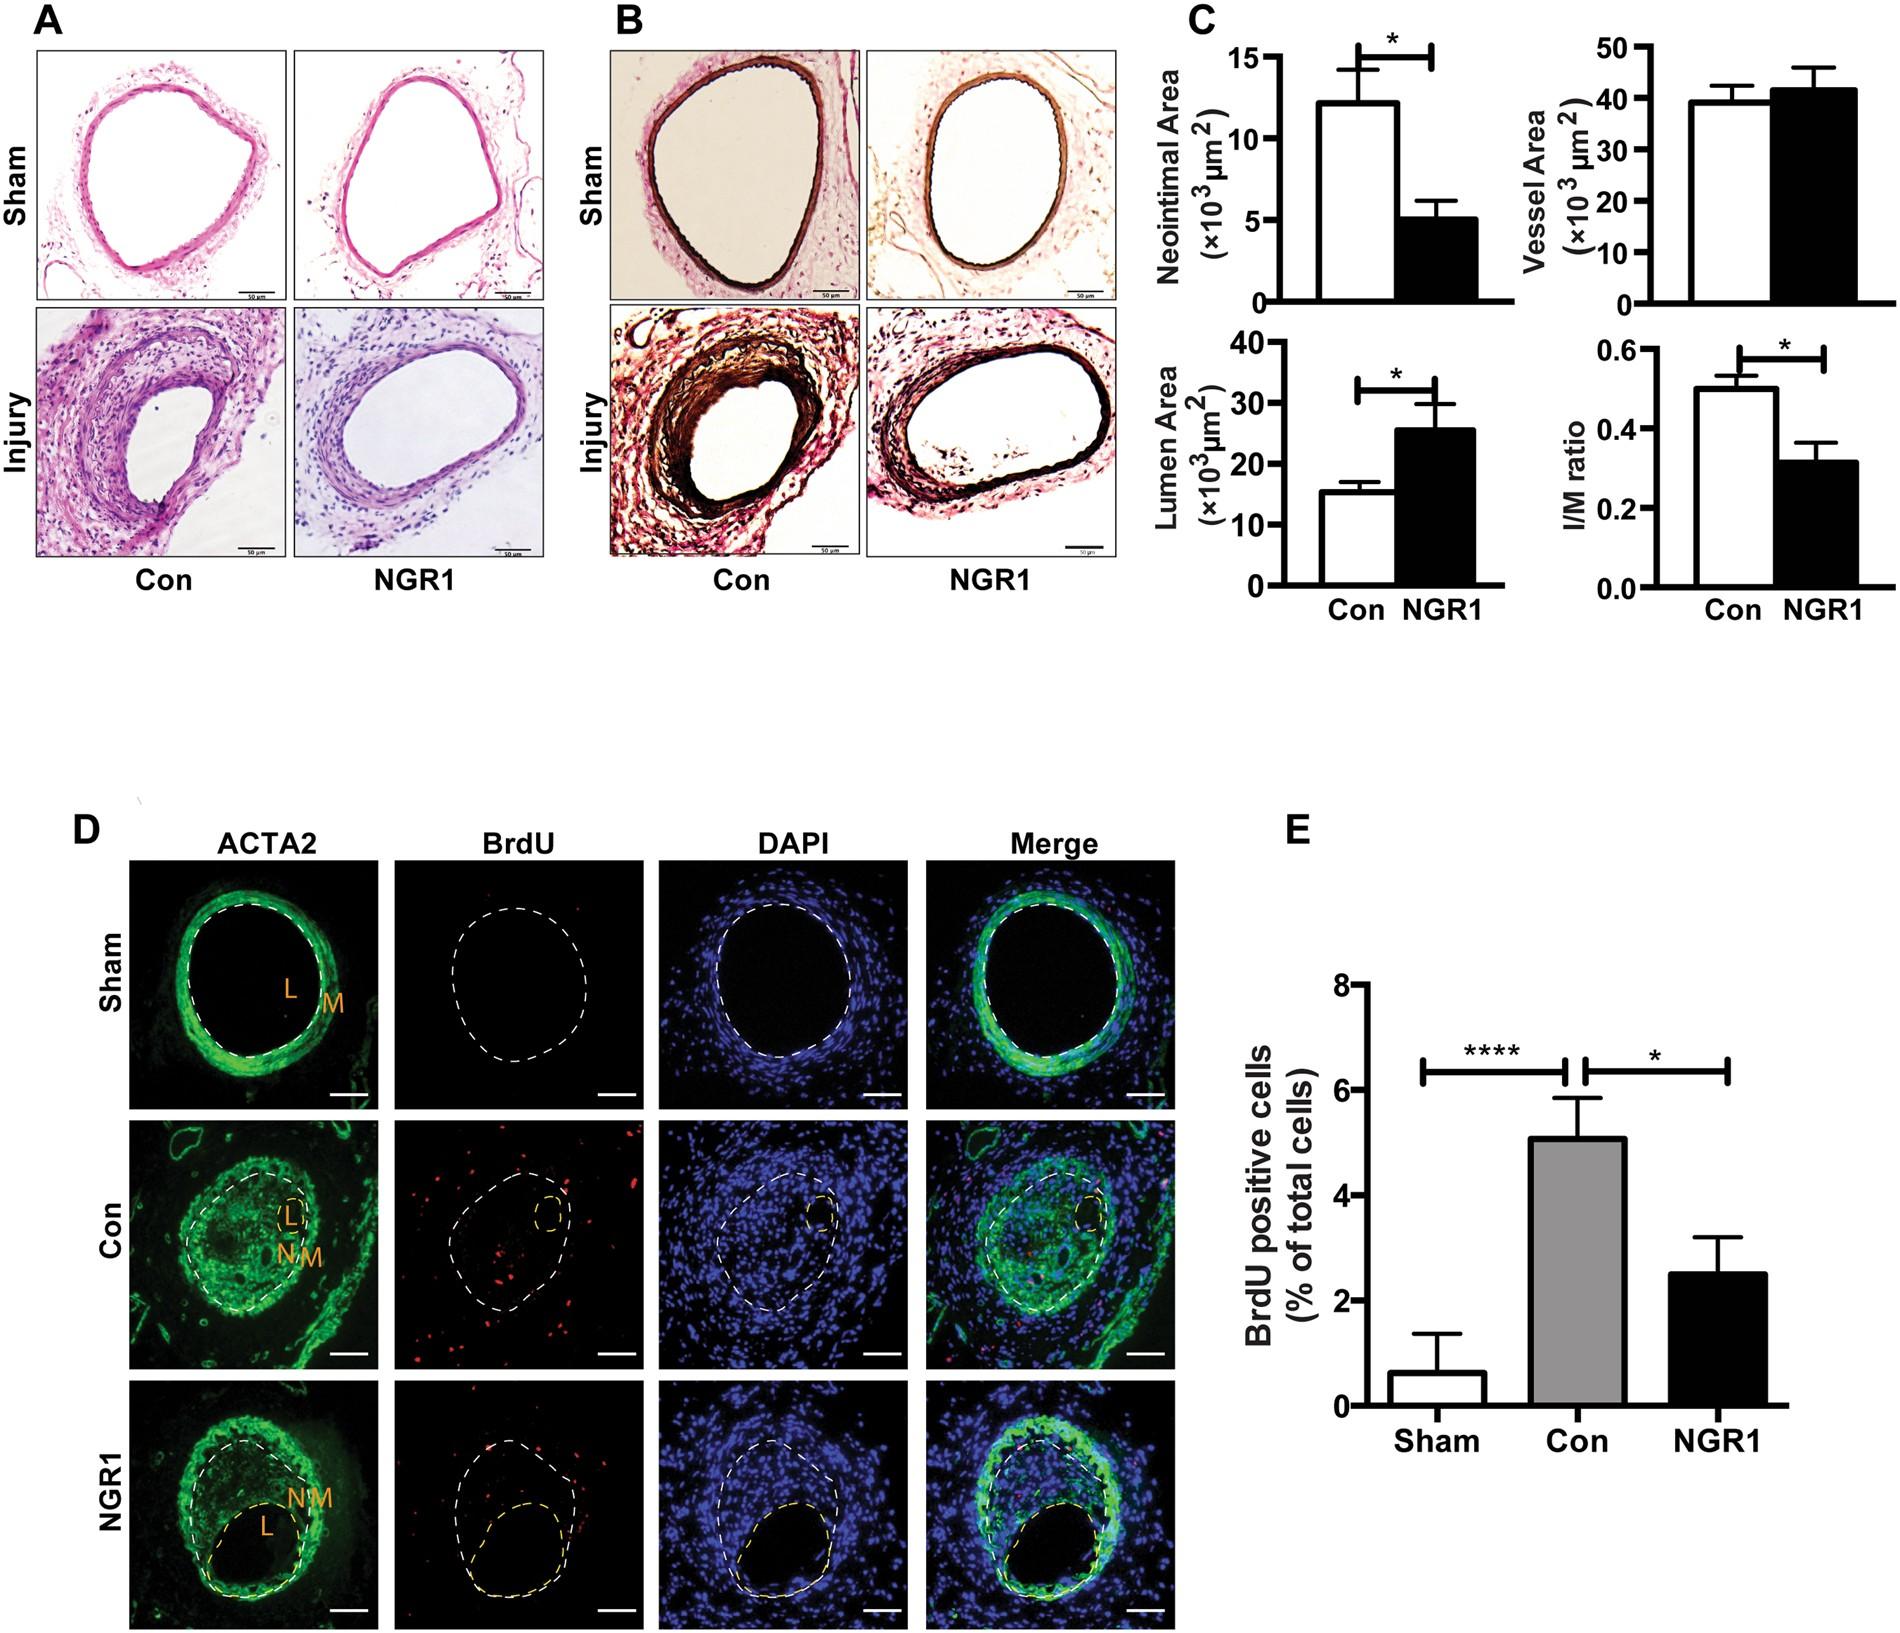 Notoginsenoside R1 Inhibits Vascular Smooth Muscle Cell Jackson Cvr Humbucker Wiring Diagram Proliferation Migration And Neointimal Hyperplasia Through Pi3k Akt Signaling Scientific Reports